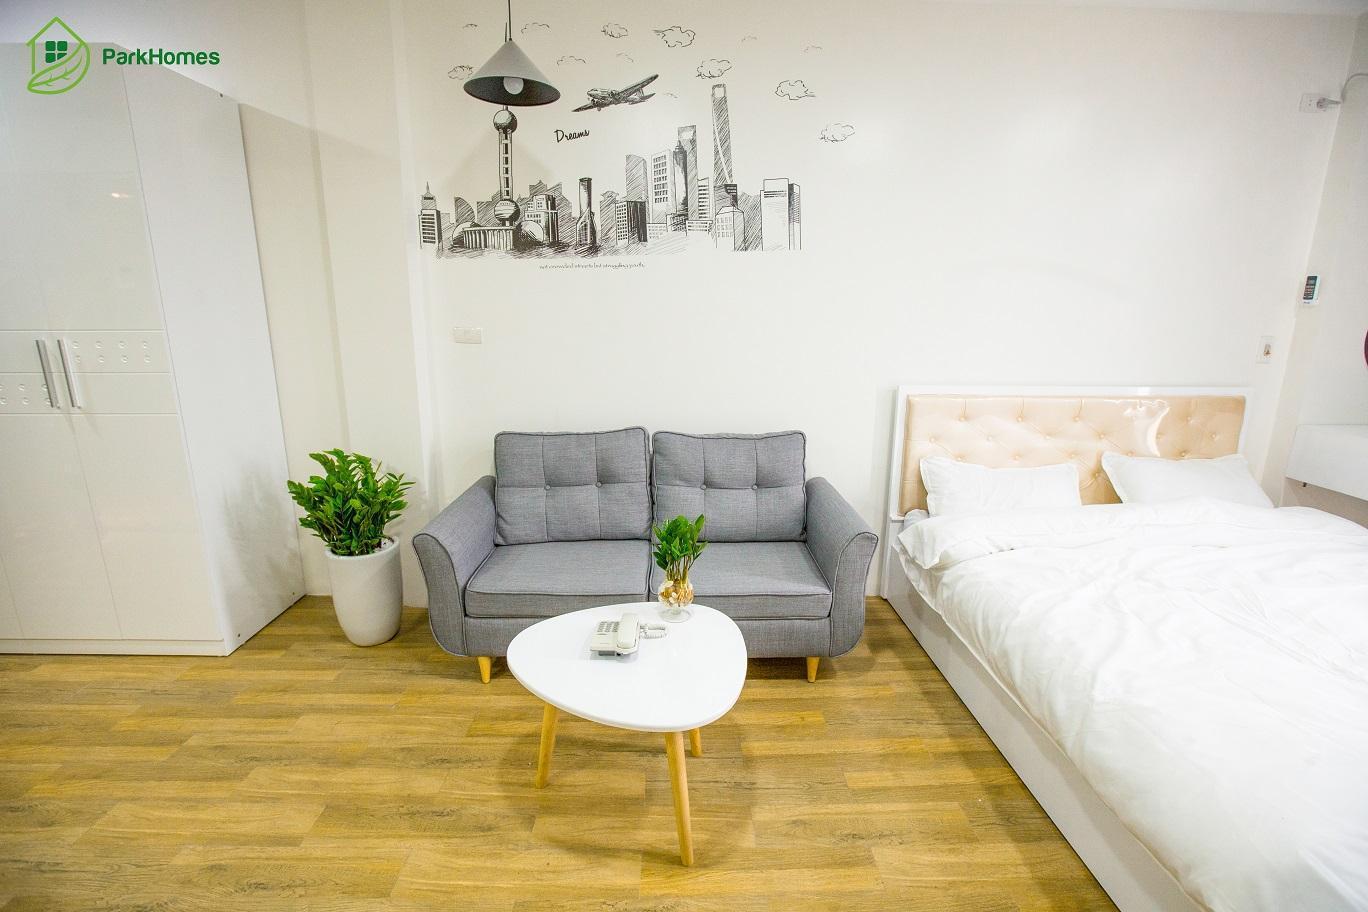 Parkhomes Apartment